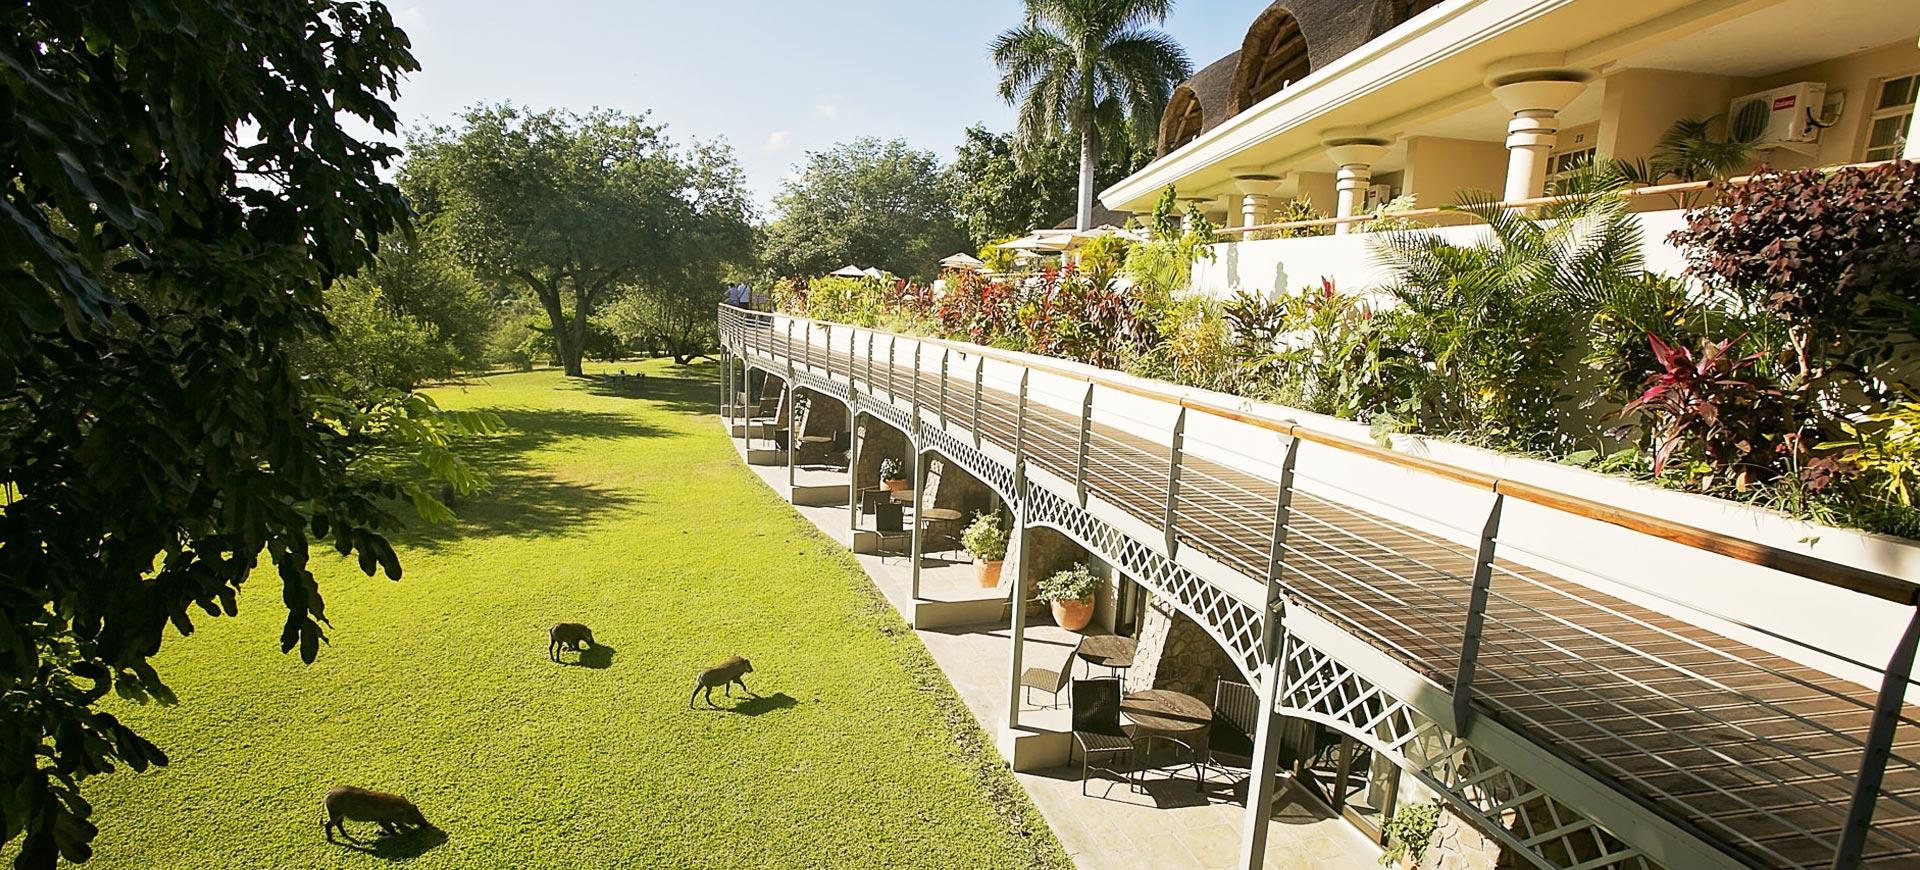 Ilala Lodge Lawns